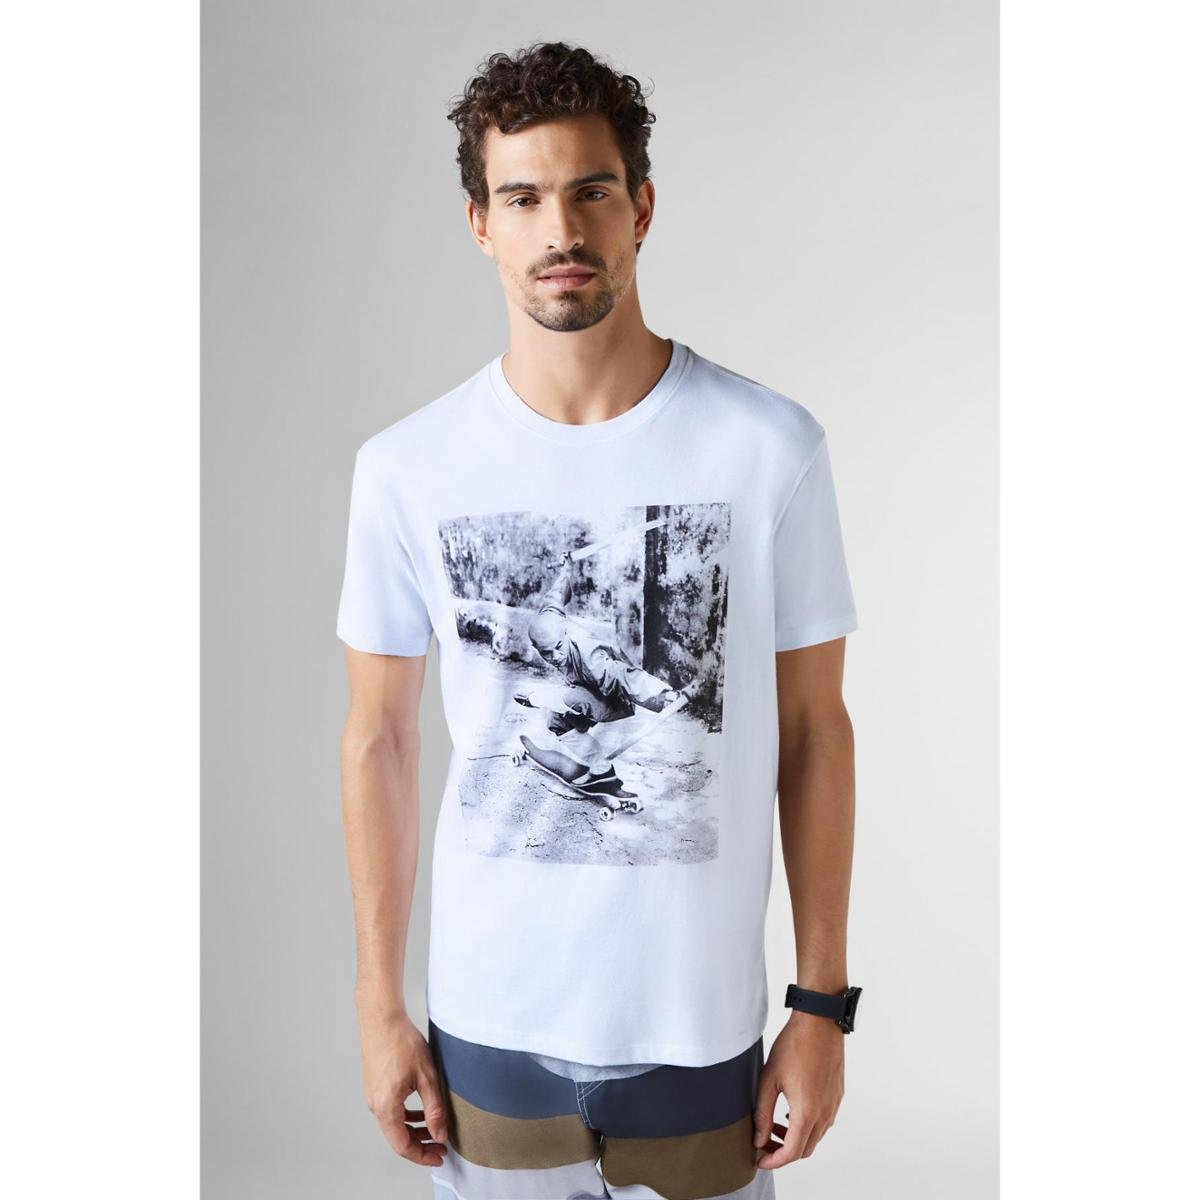 bac5c6ddc6 Camiseta Reserva Estampada Monk Masculina - Branco - Compre Agora ...